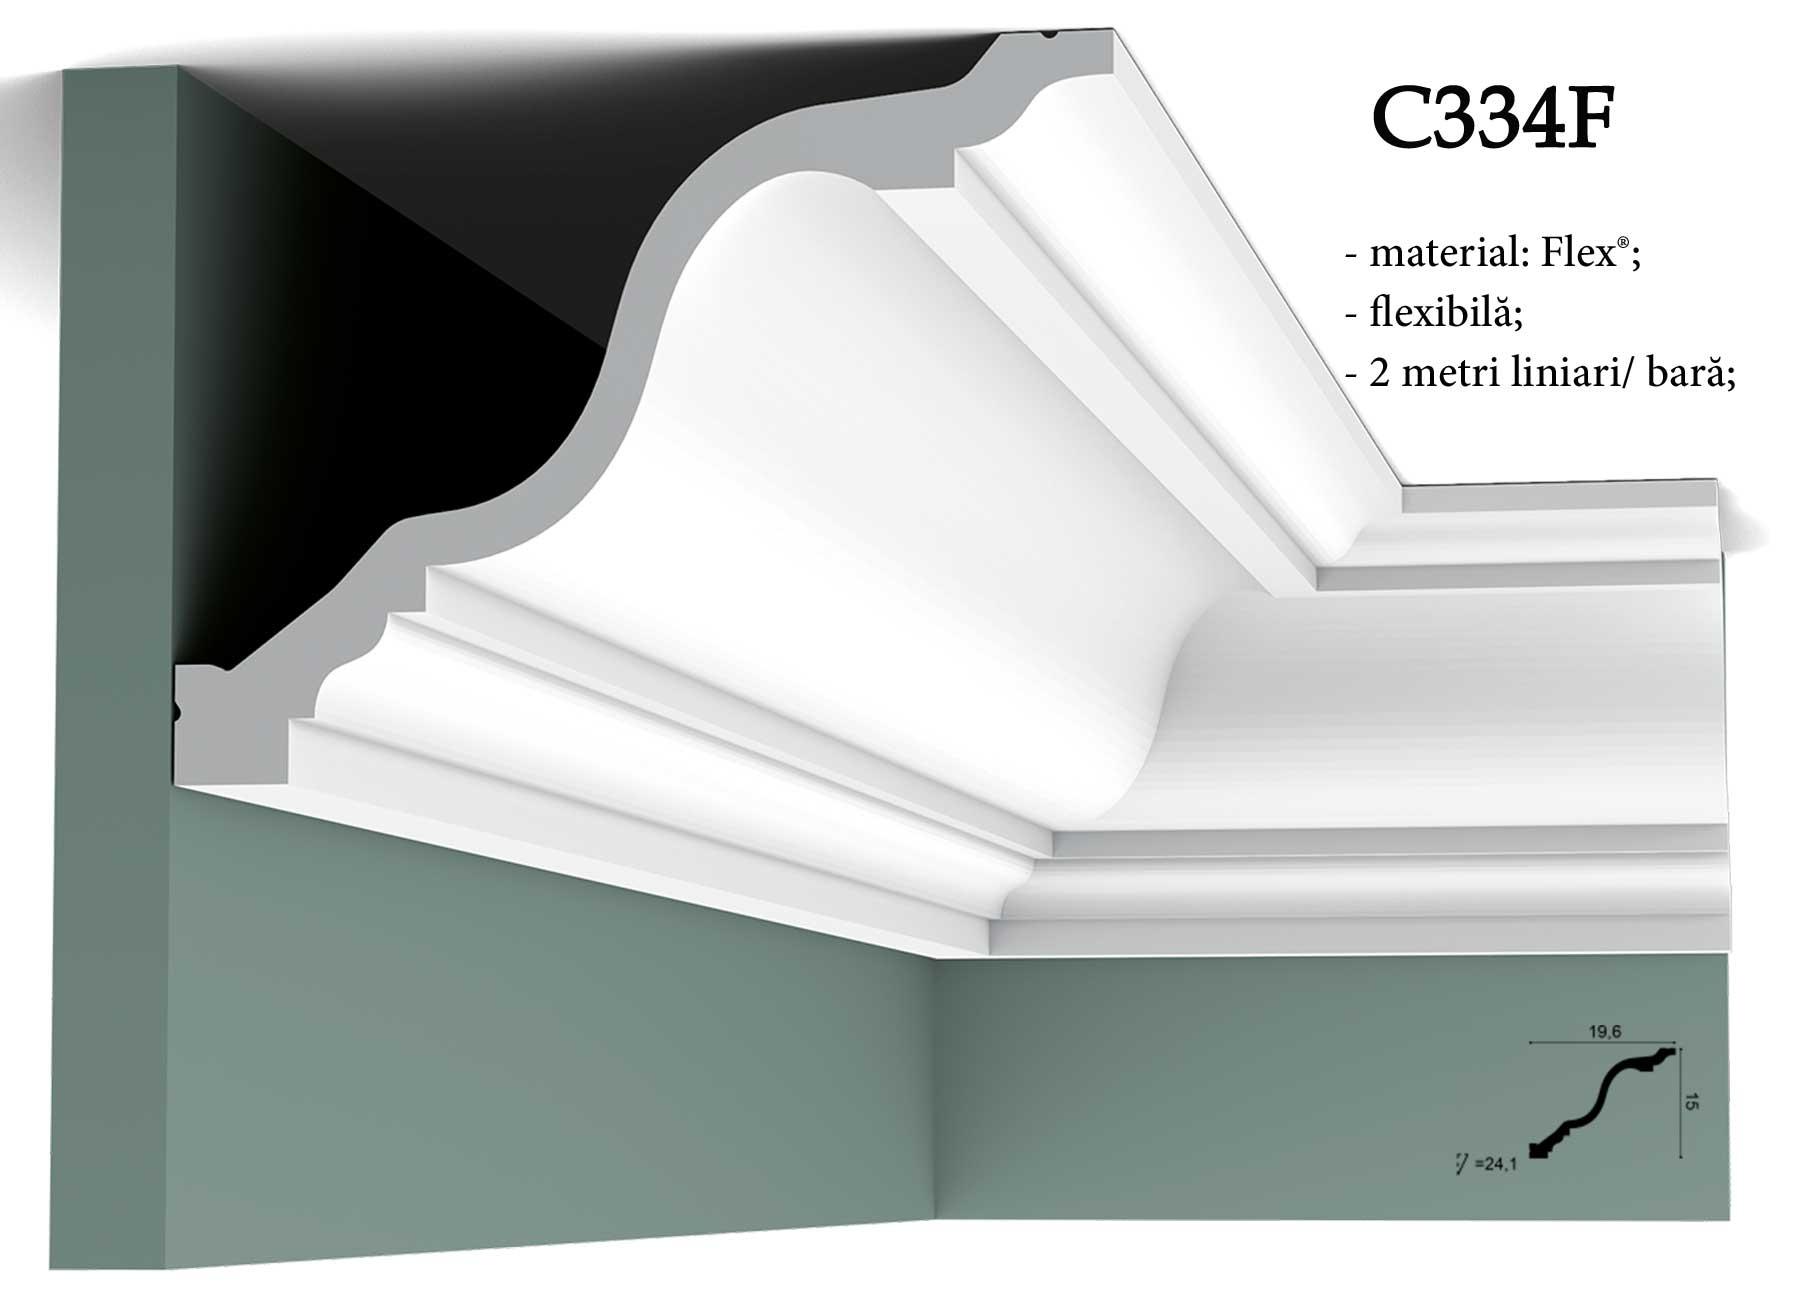 Bliss Art - Cornisa alba flexibila pentru tavan Orac Decor C334F